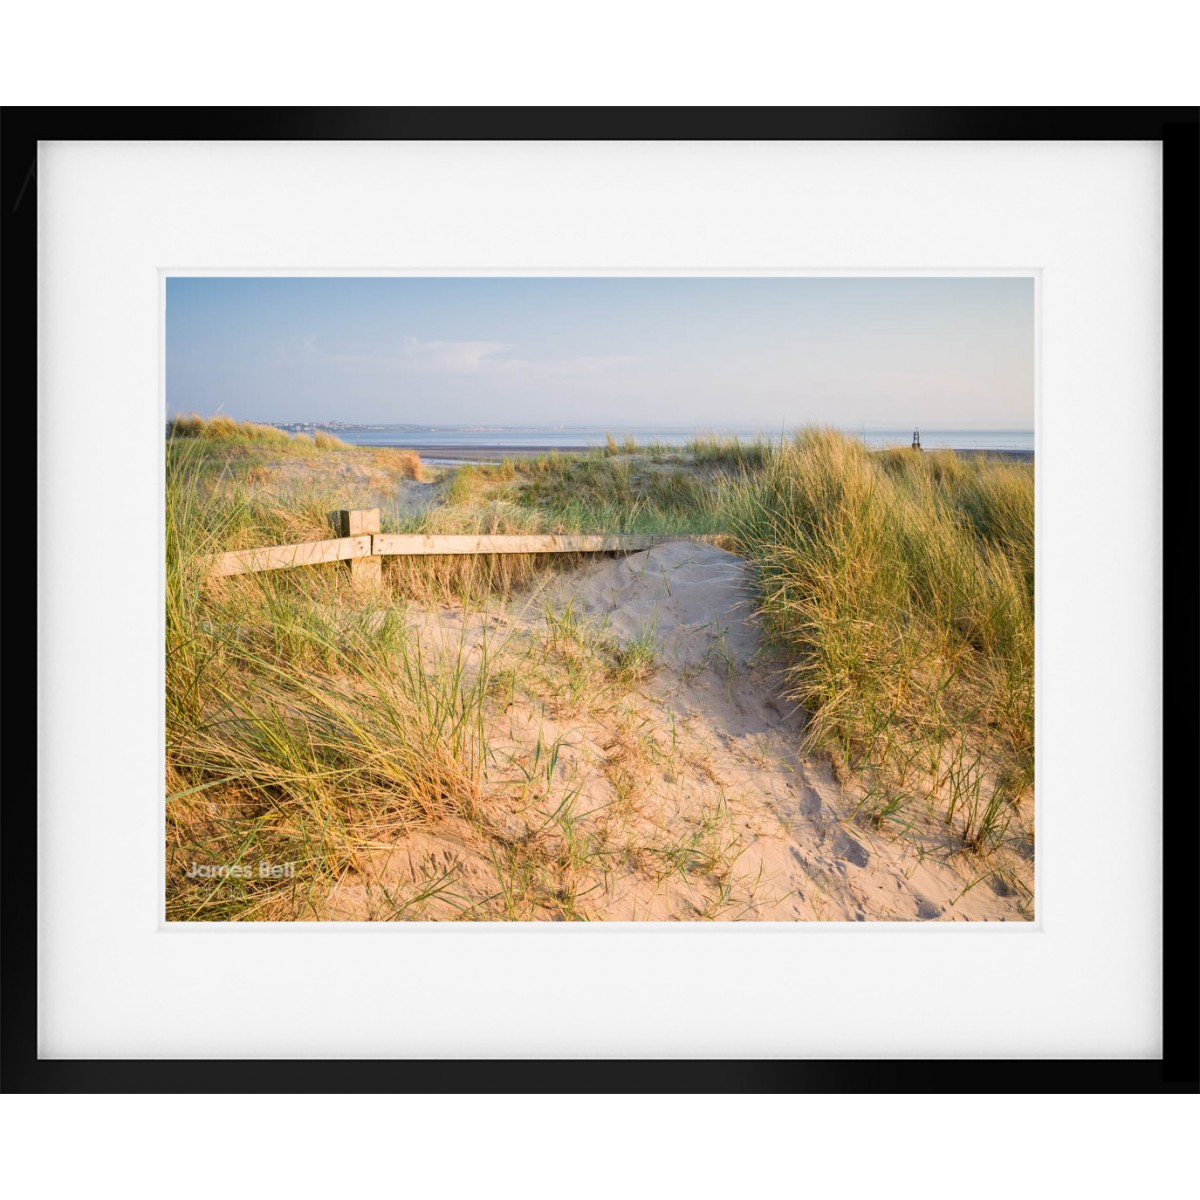 Crosby Dunes framed print